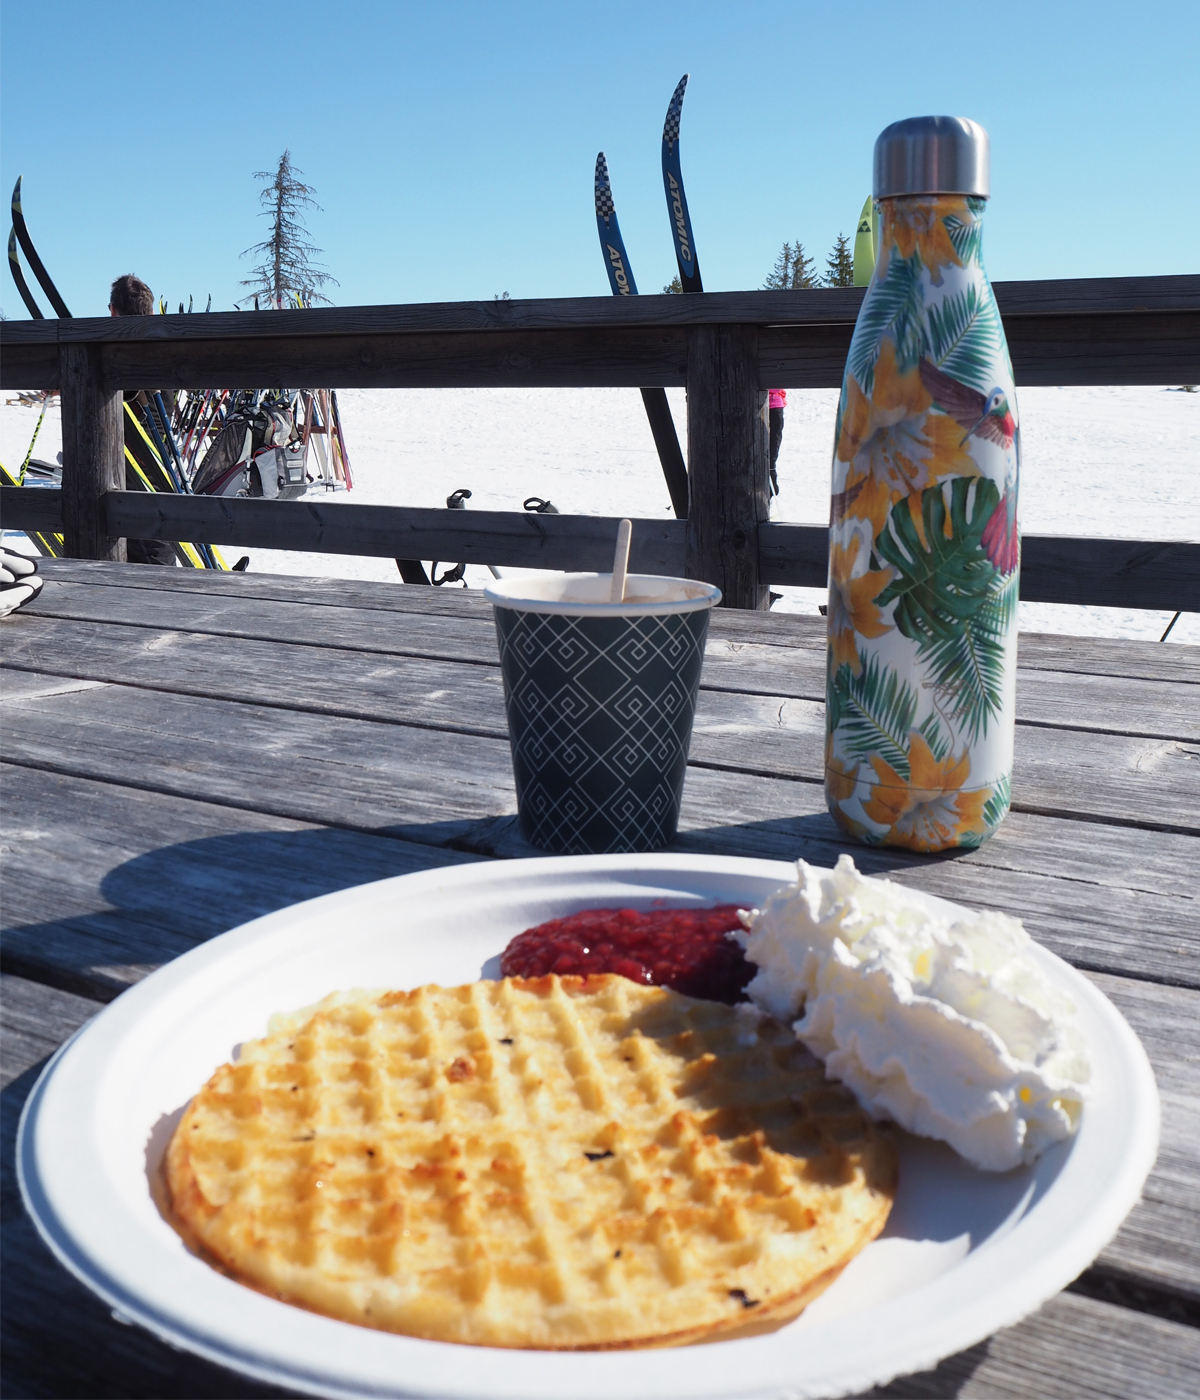 Waffle and hot chocolate break